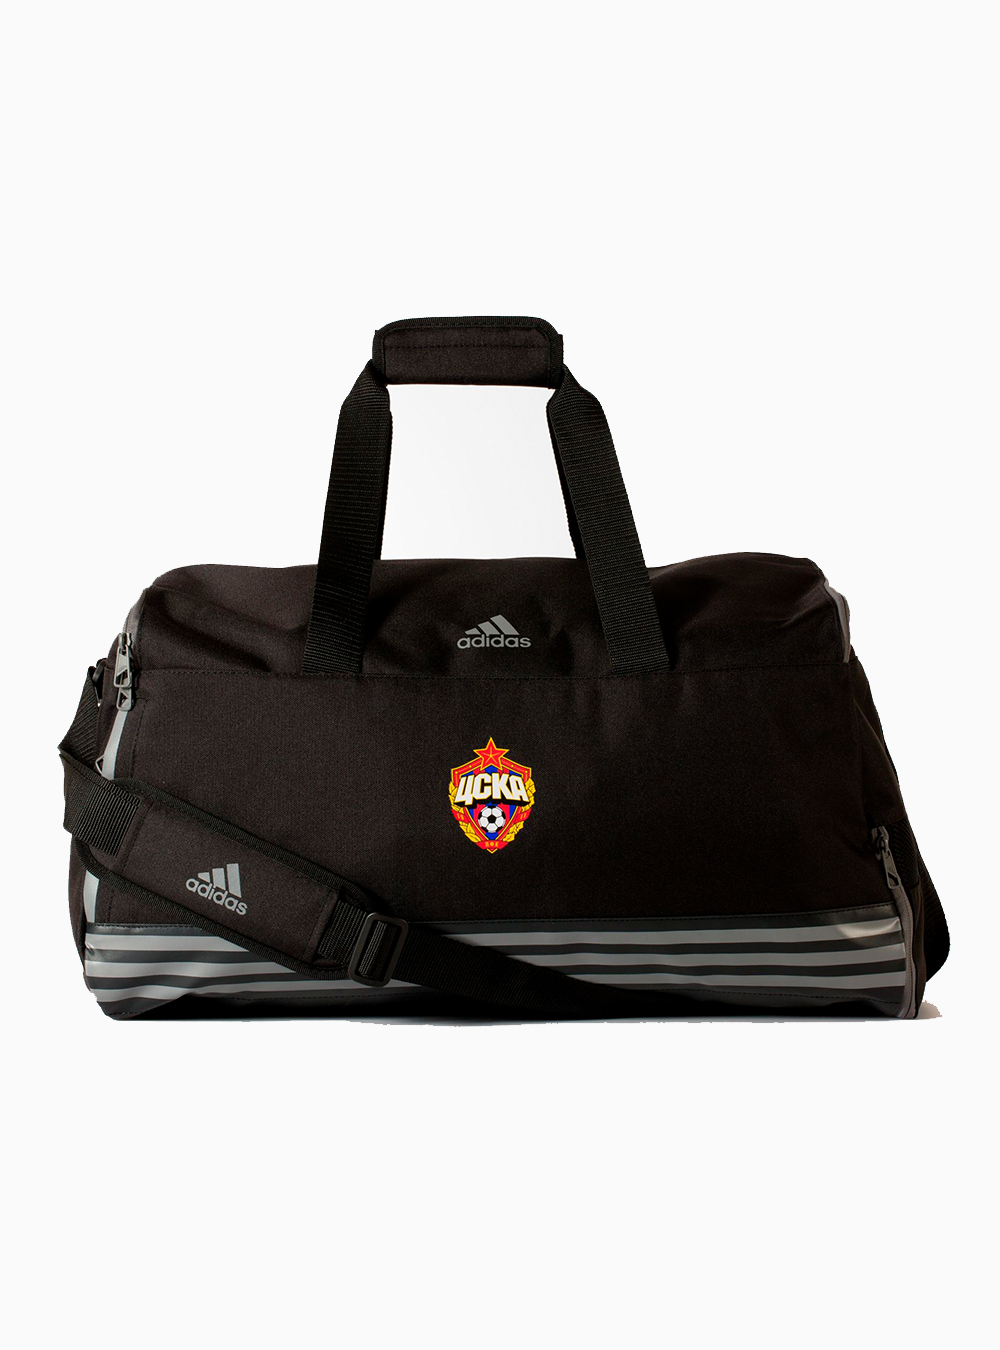 22a0bb54f75a Спортивная сумка (BR0820) / Аксессуары / Рюкзаки, сумки, галантерея ...